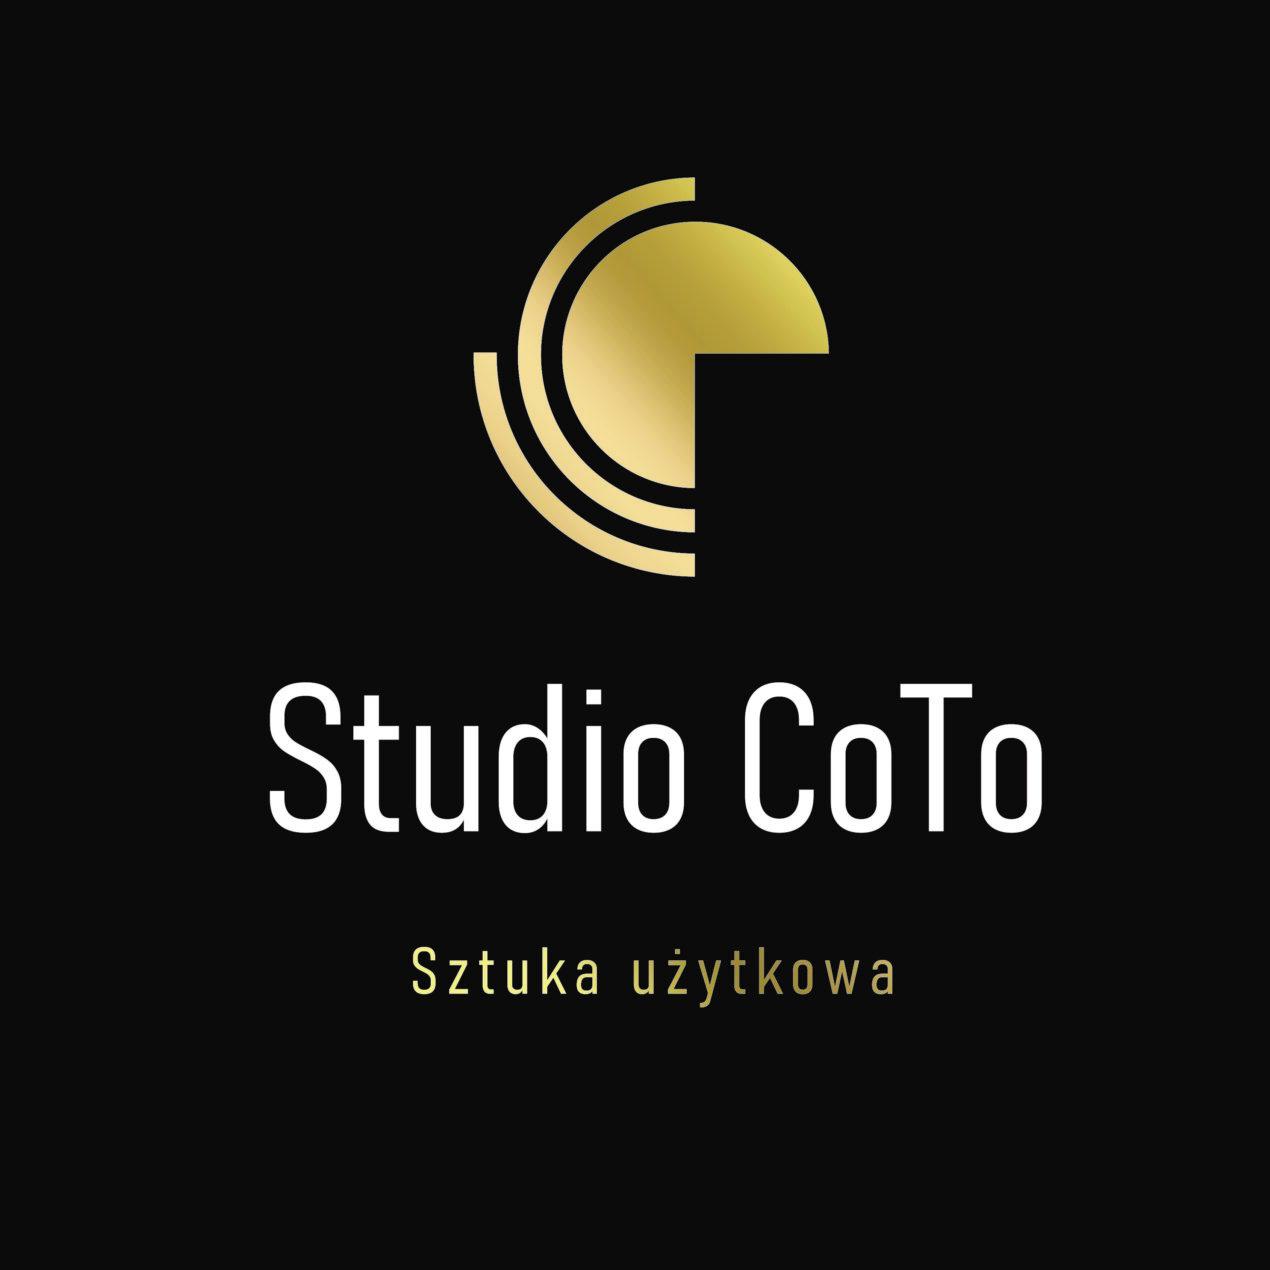 Studio CoTo